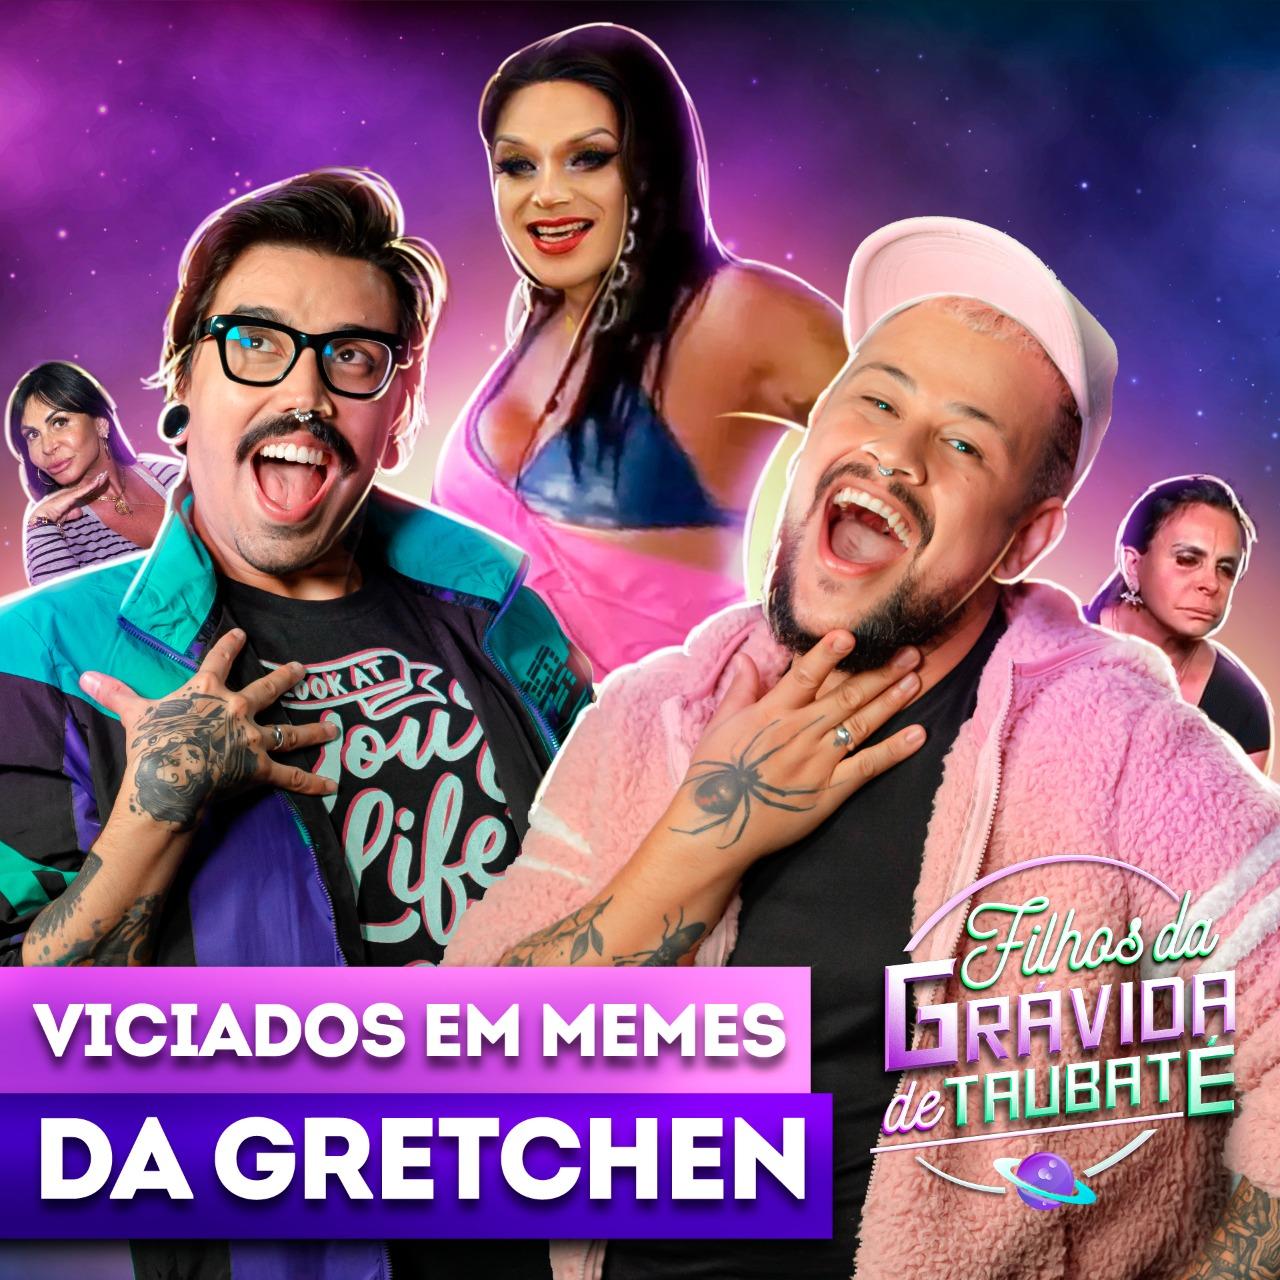 #140 - Viciados em memes da Gretchen (feat. Lorelay Fox)